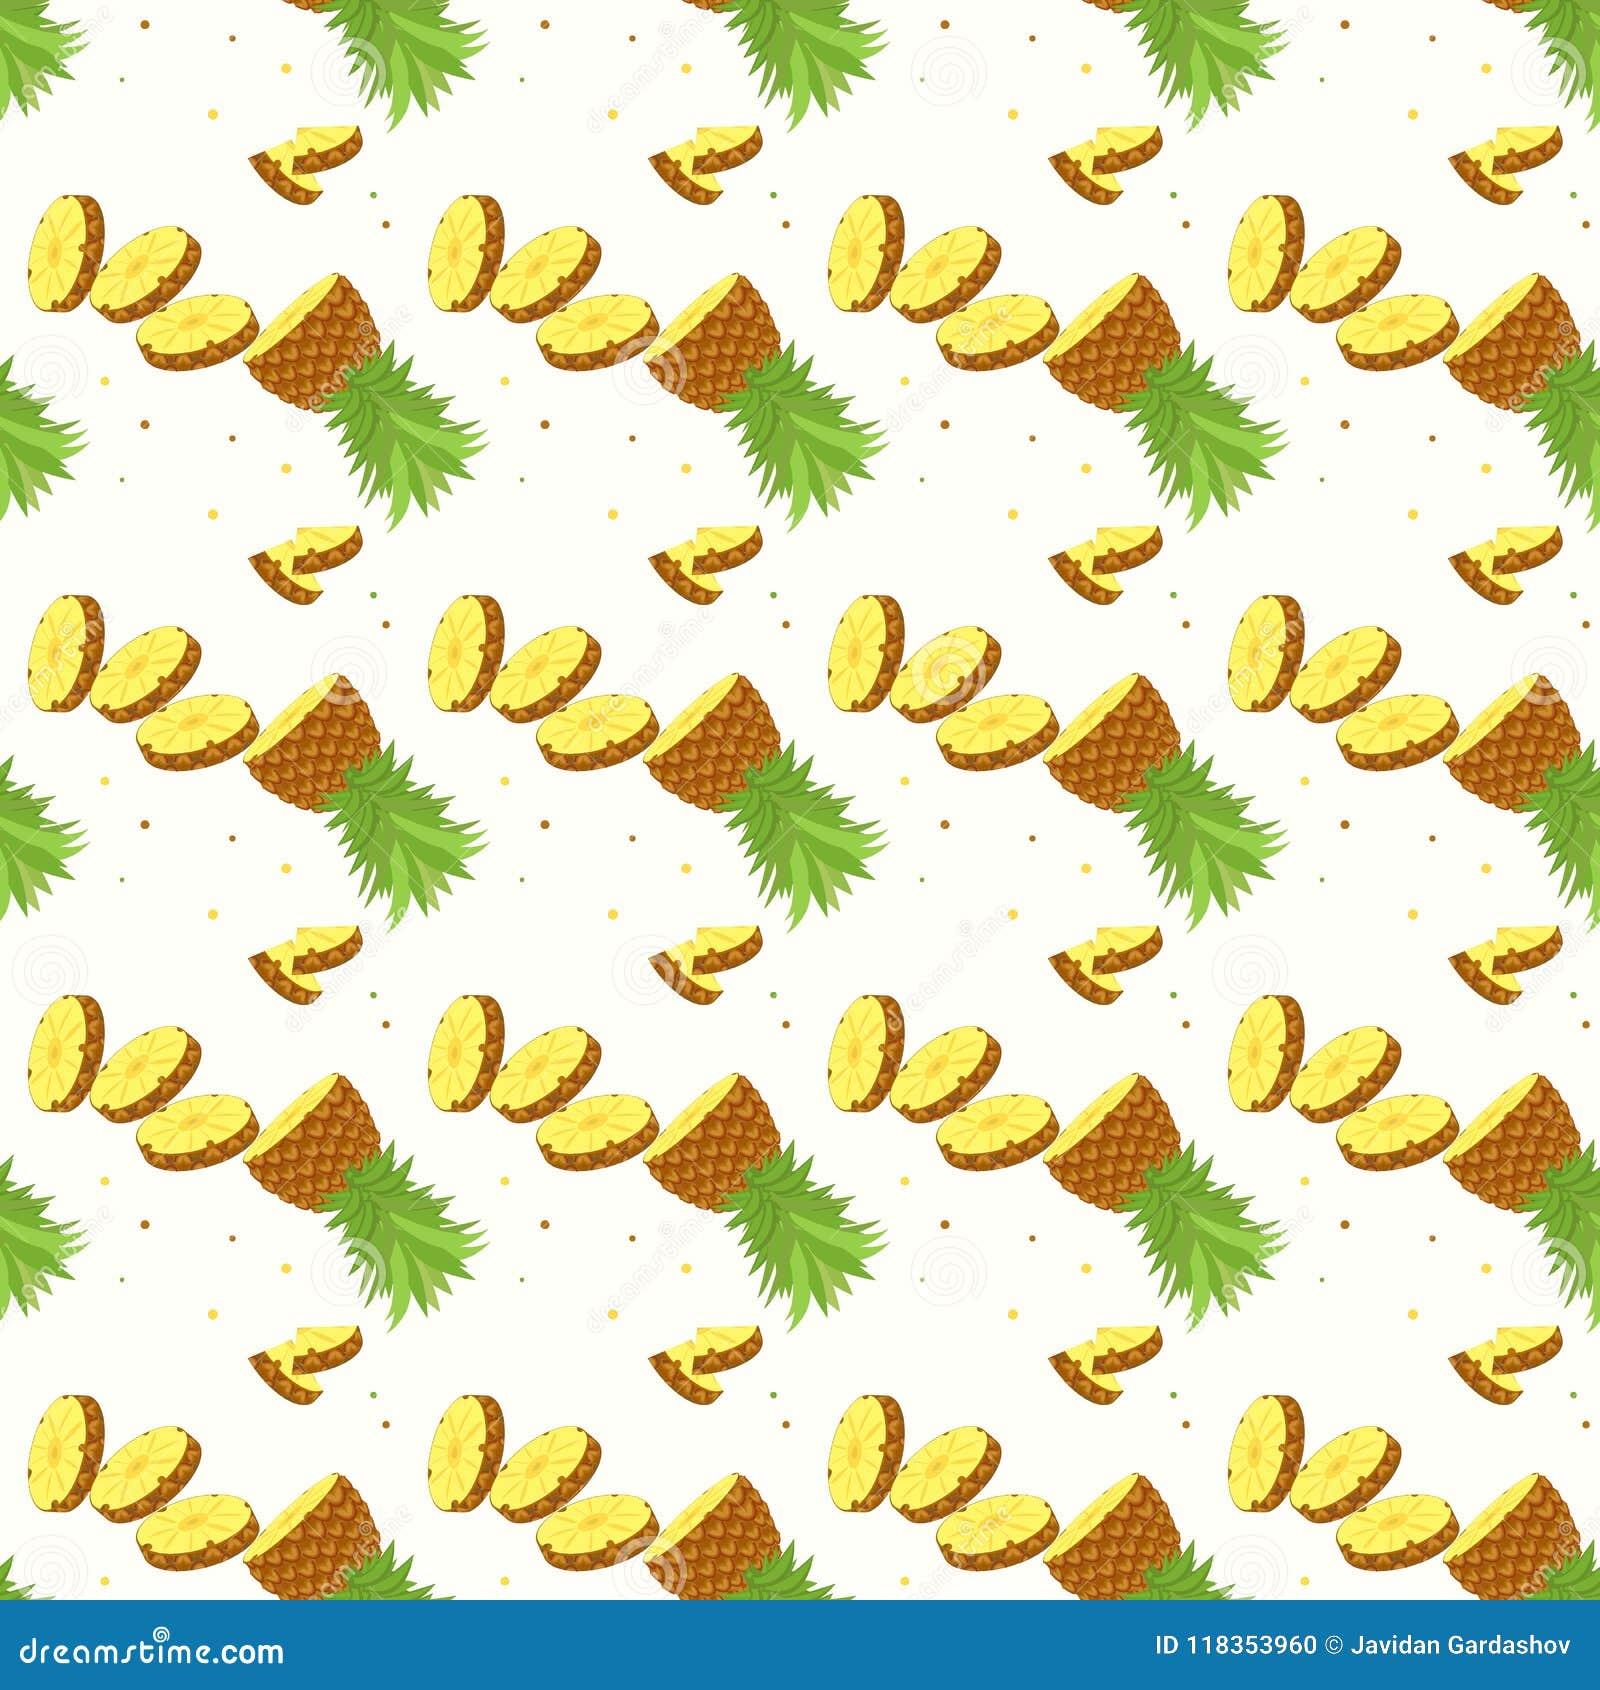 Tropical Ananas Pineapple Fruit Seamless Pattern On White